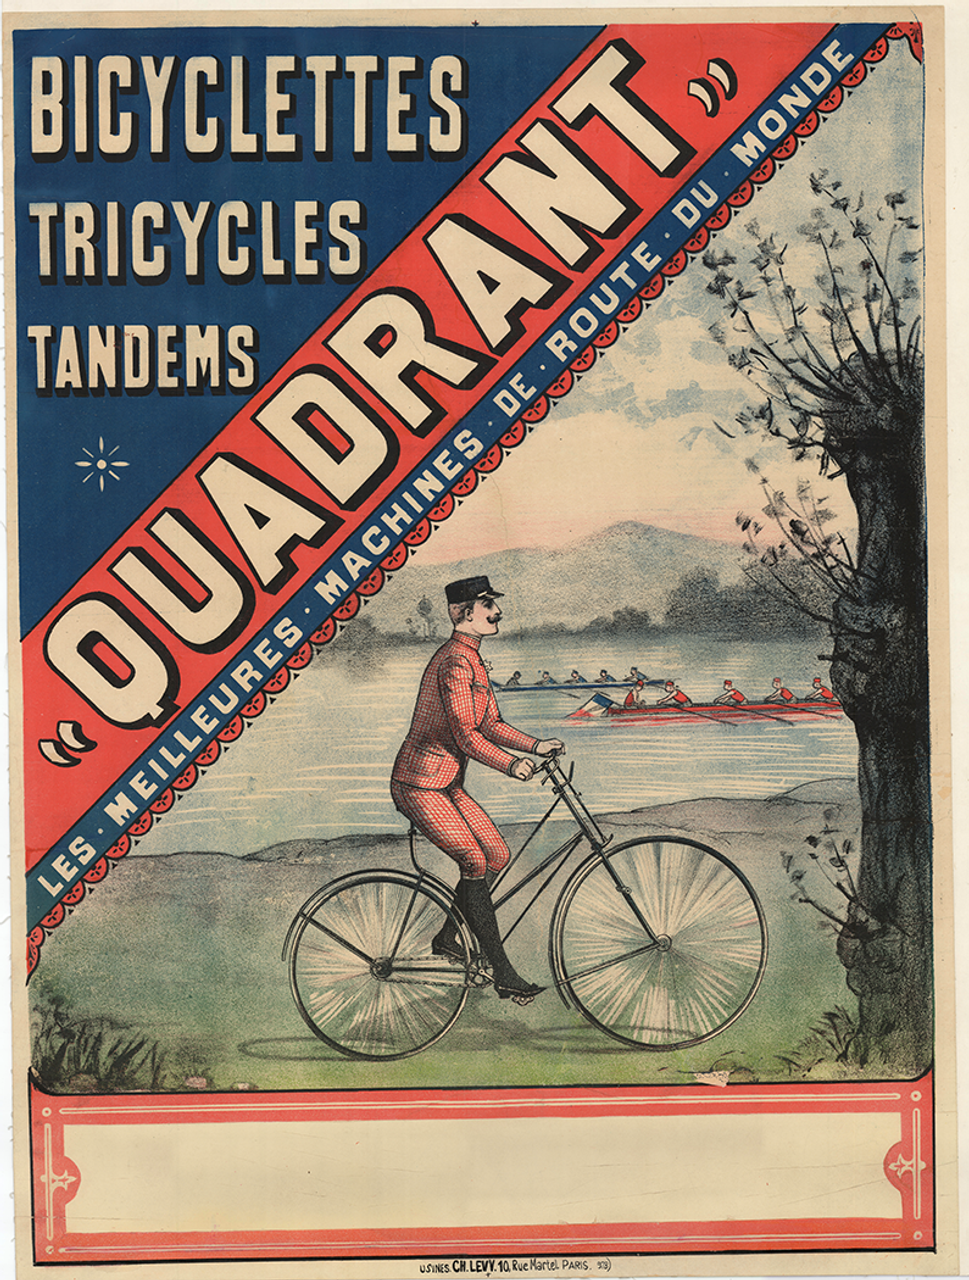 Bicyclettes Quadrant Original Vintage Bicycle Poster